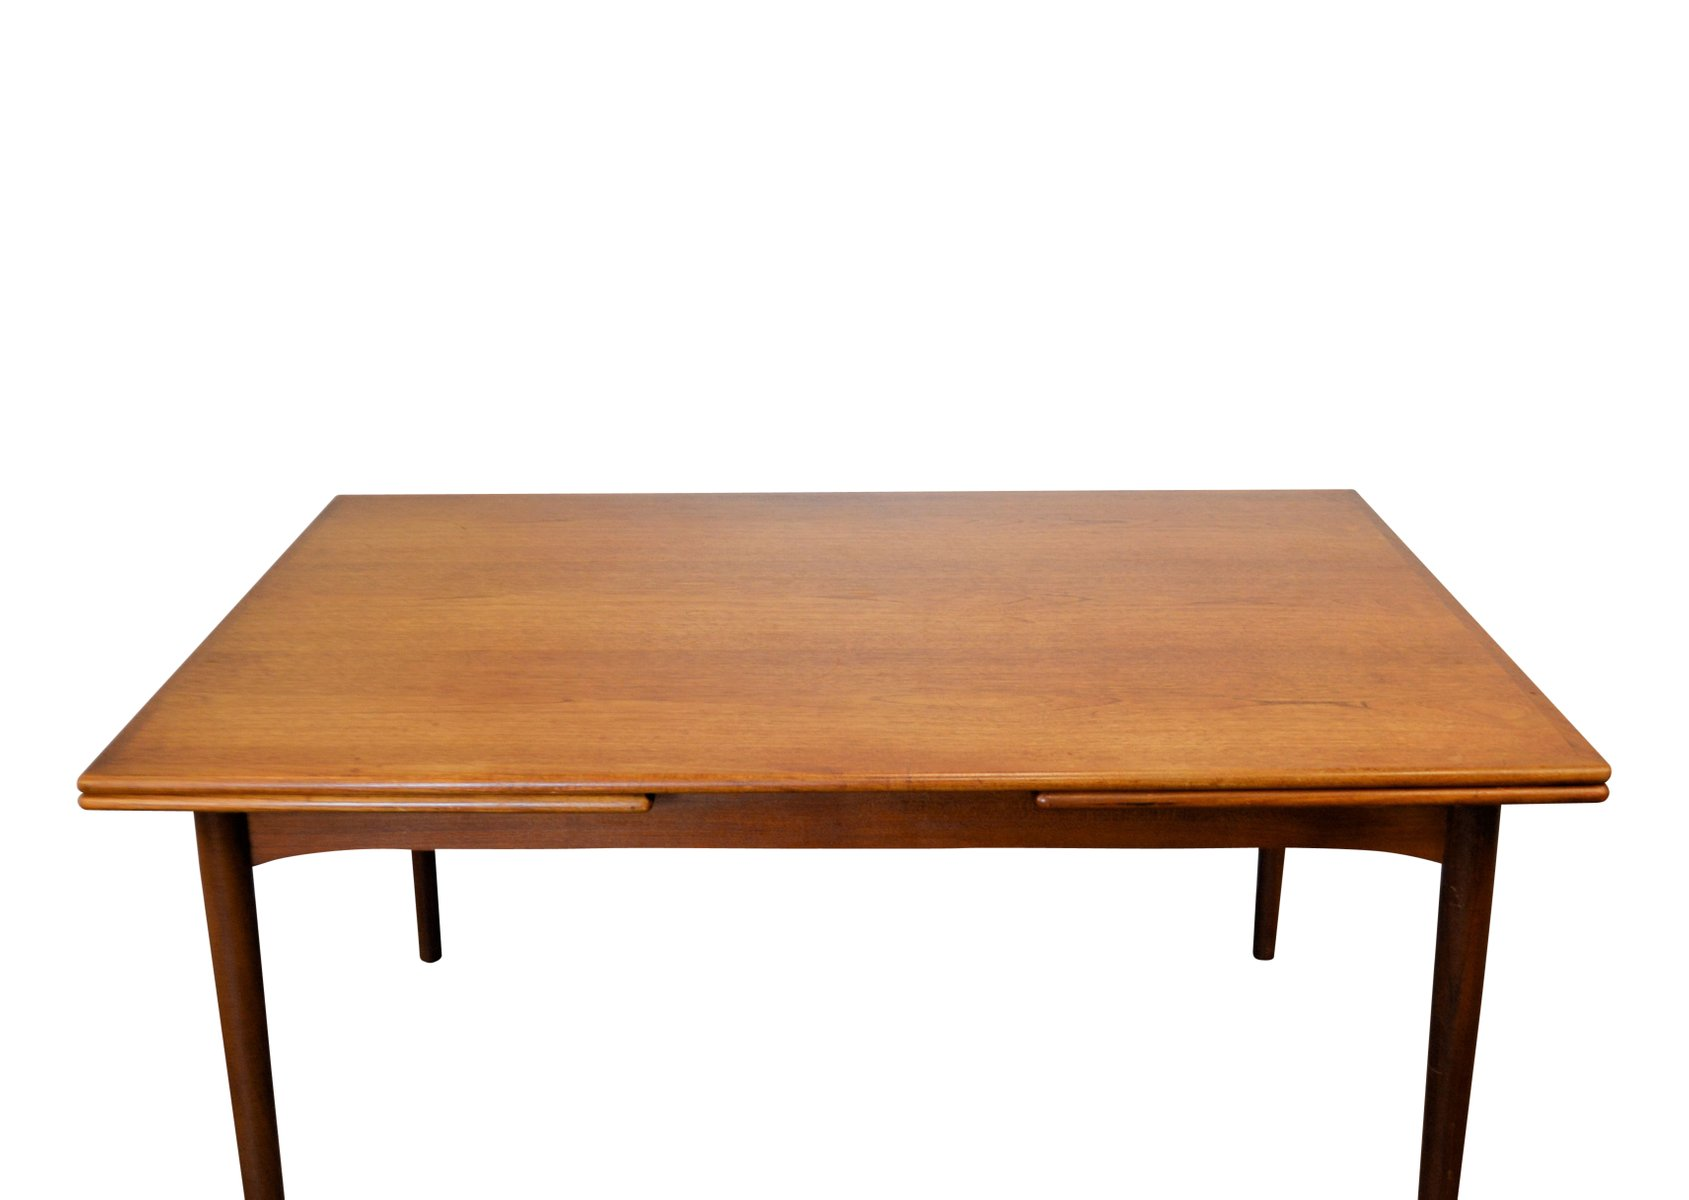 Vintage Danish Extendable Teak Dining Table for sale at Pamono : vintage danish extendable teak dining table 4 from www.pamono.com size 1690 x 1200 jpeg 61kB